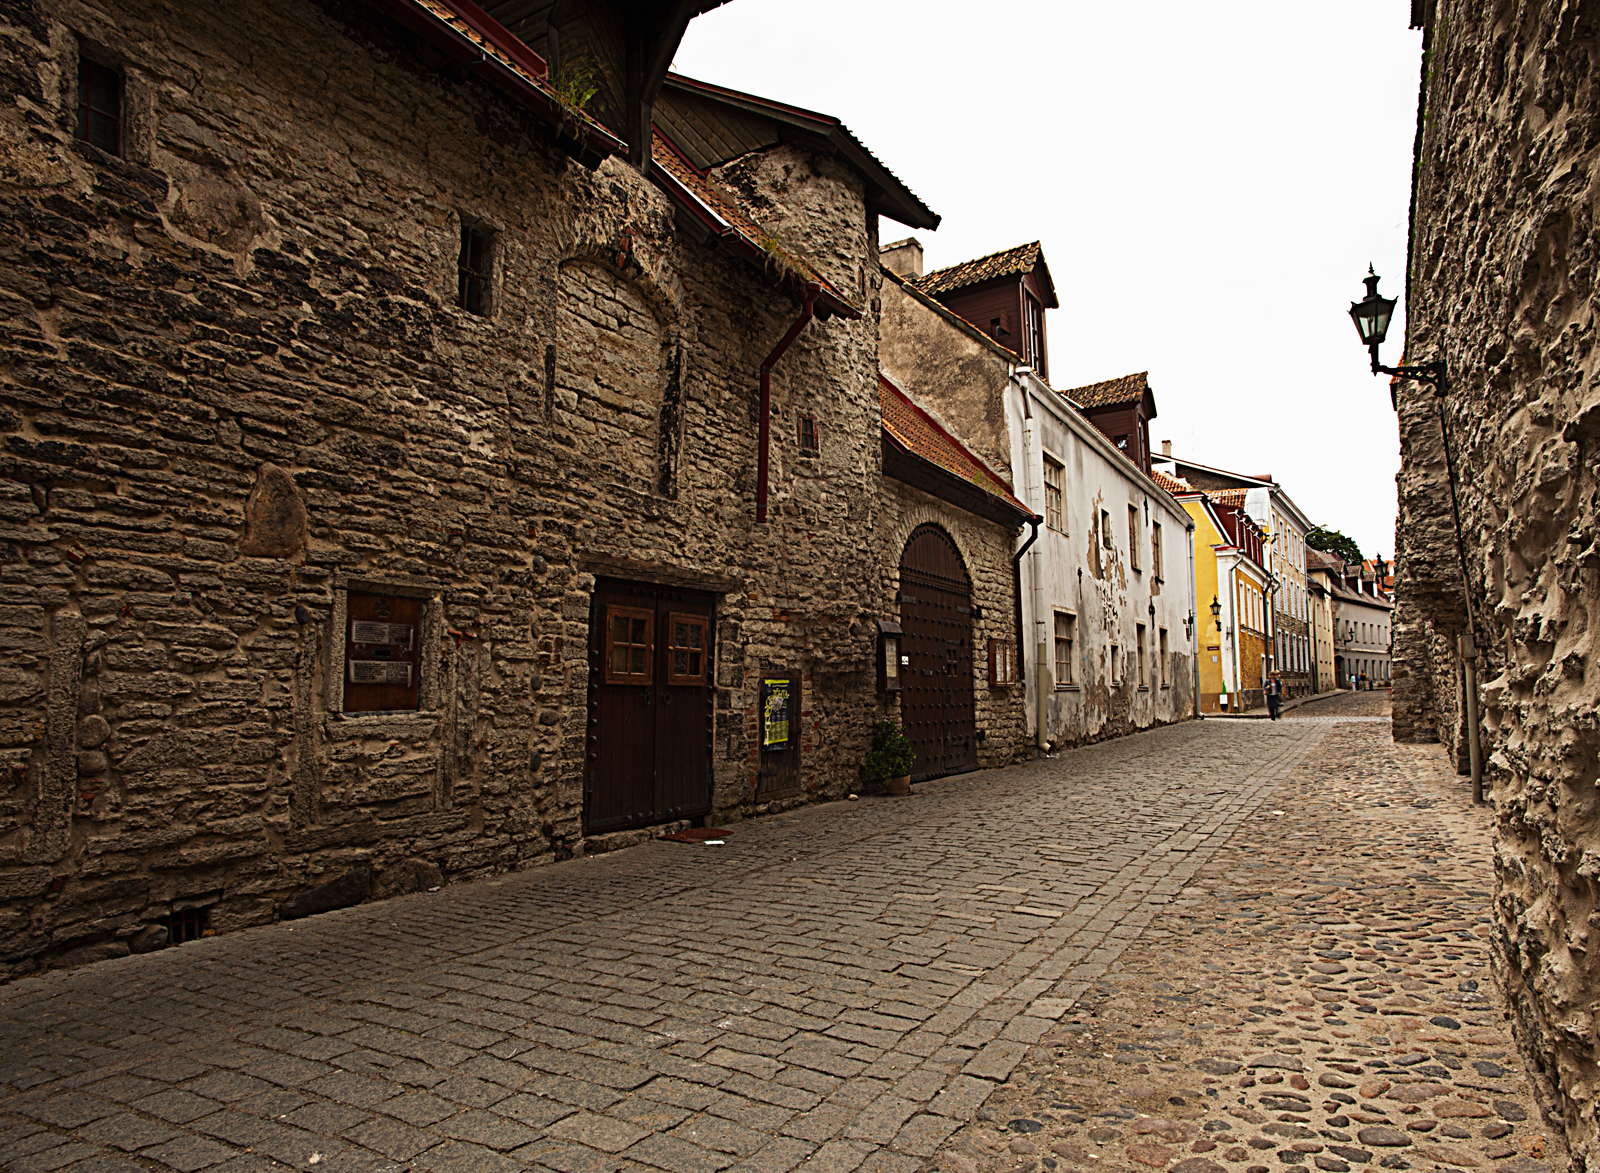 Street Views Old Castle Walls Encasing The Old Medieval